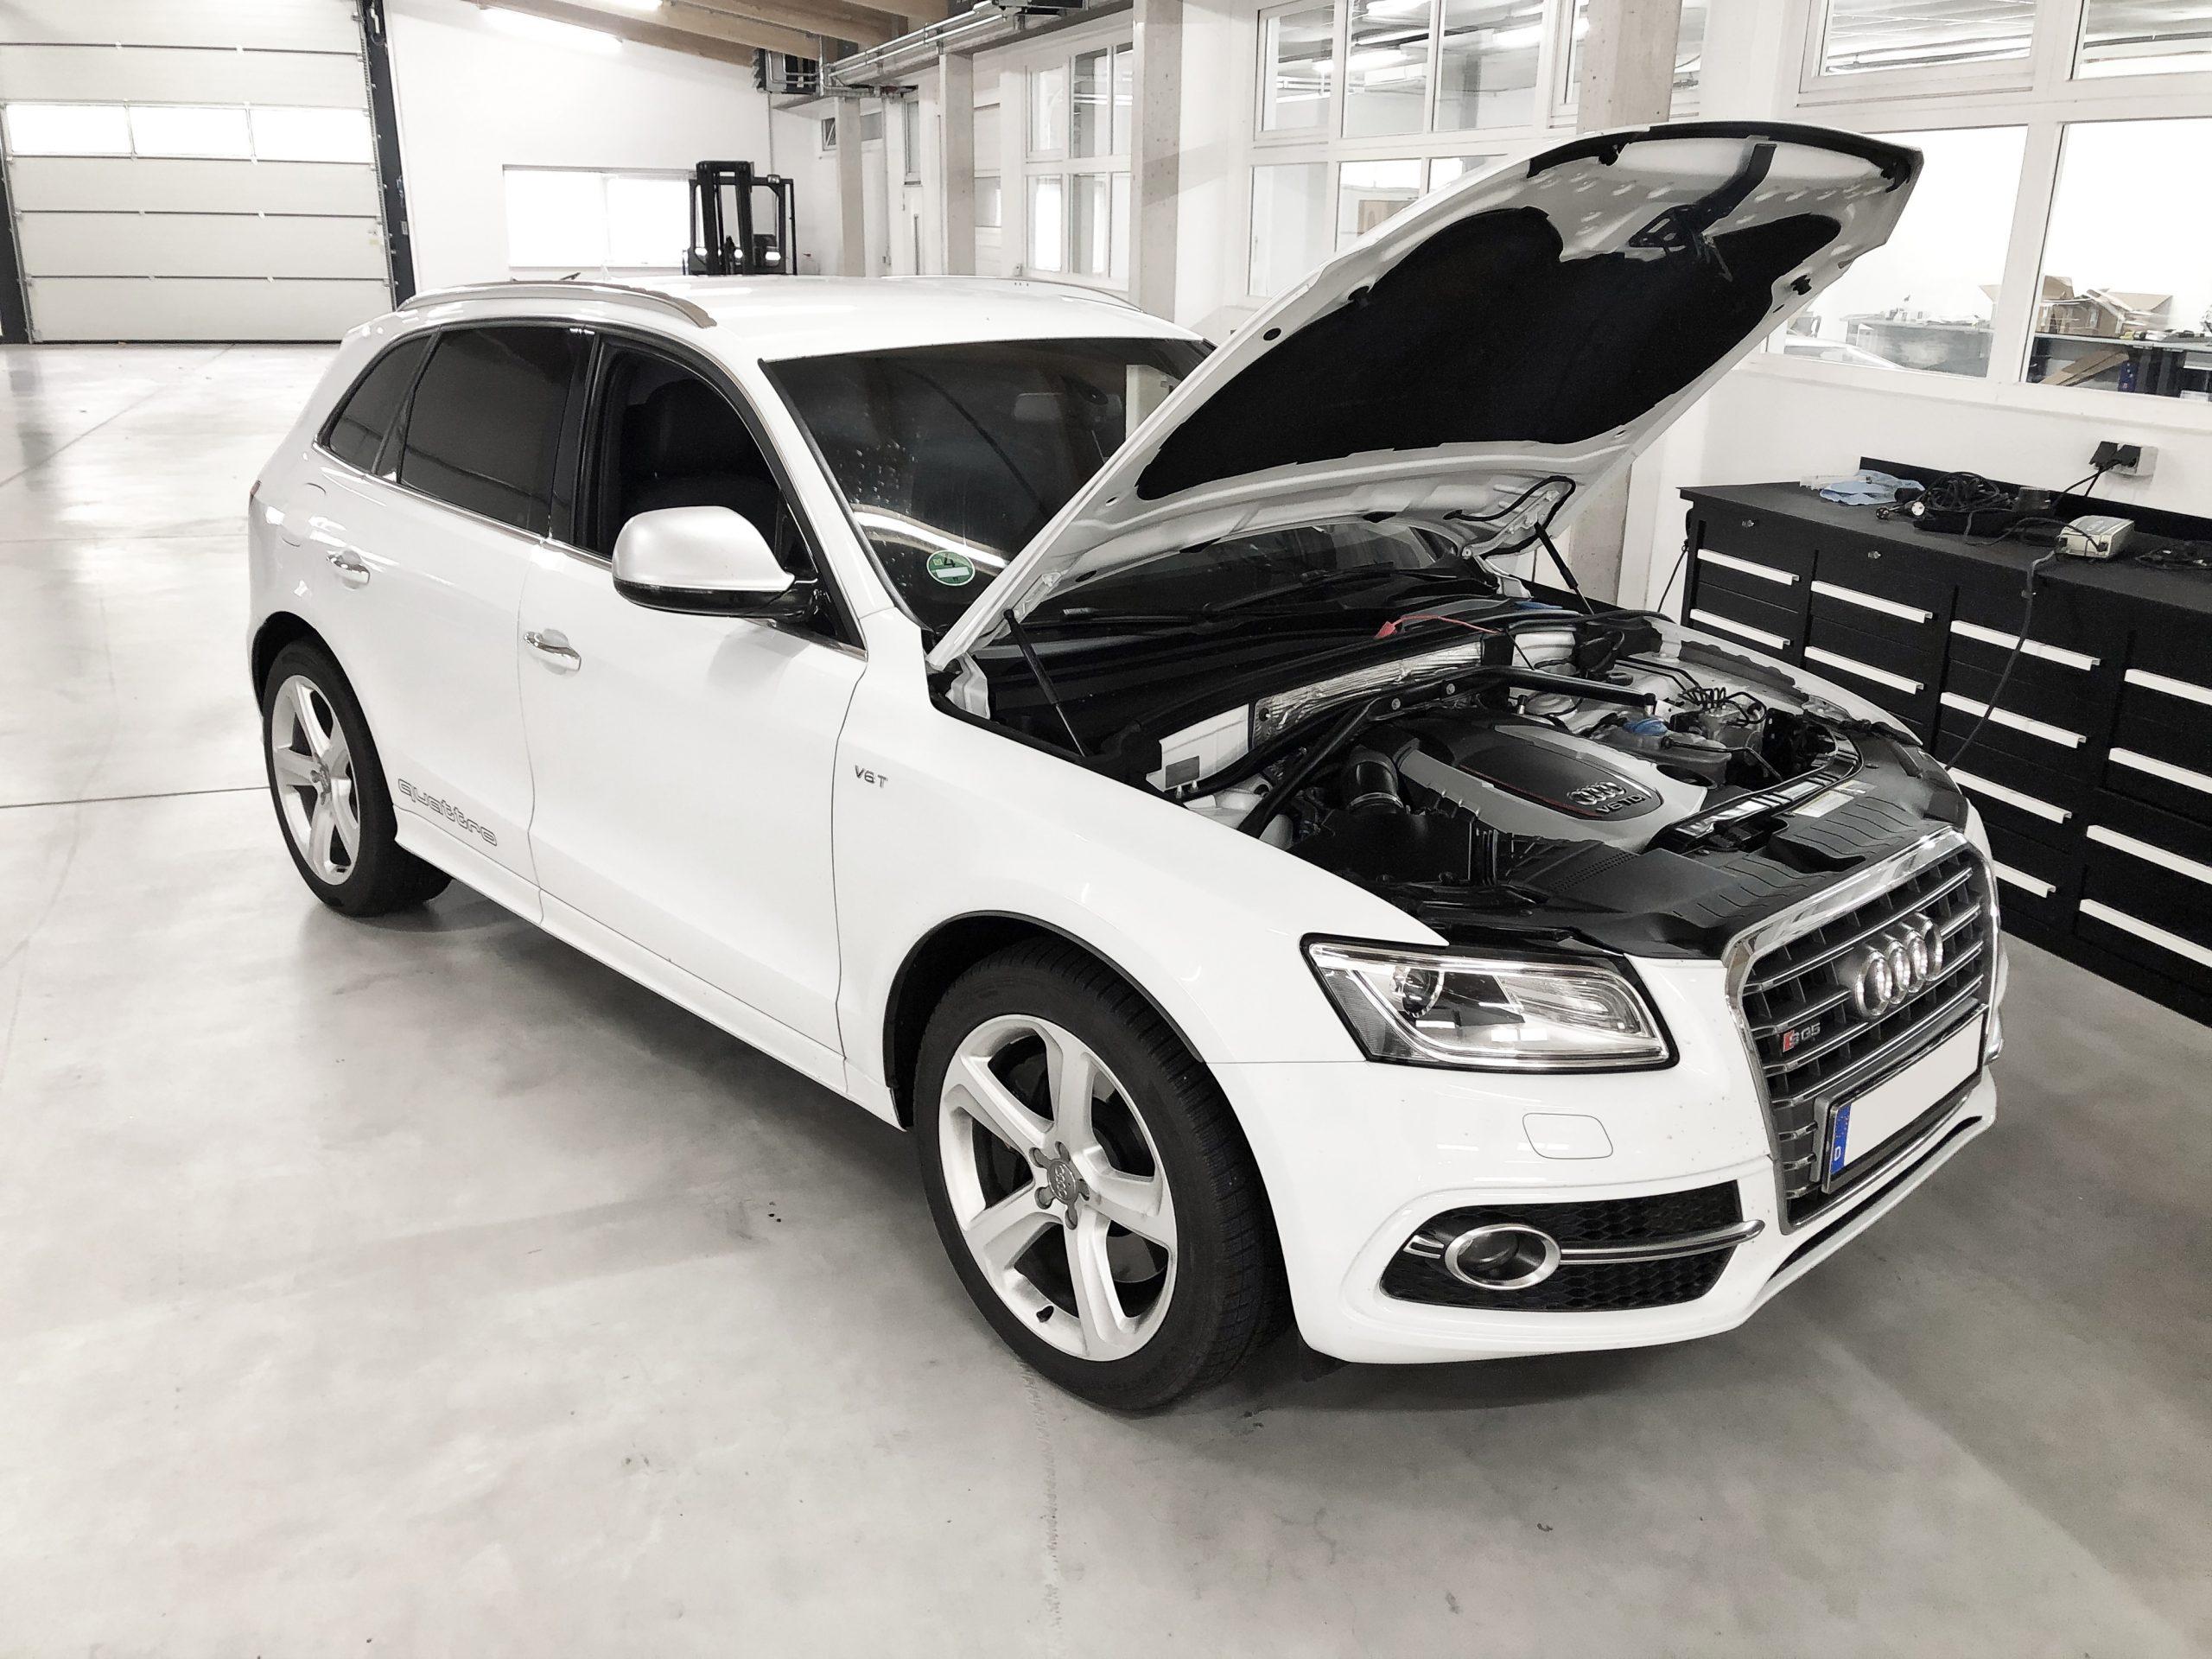 Chiptuning Audi SQ5 Diga-tec